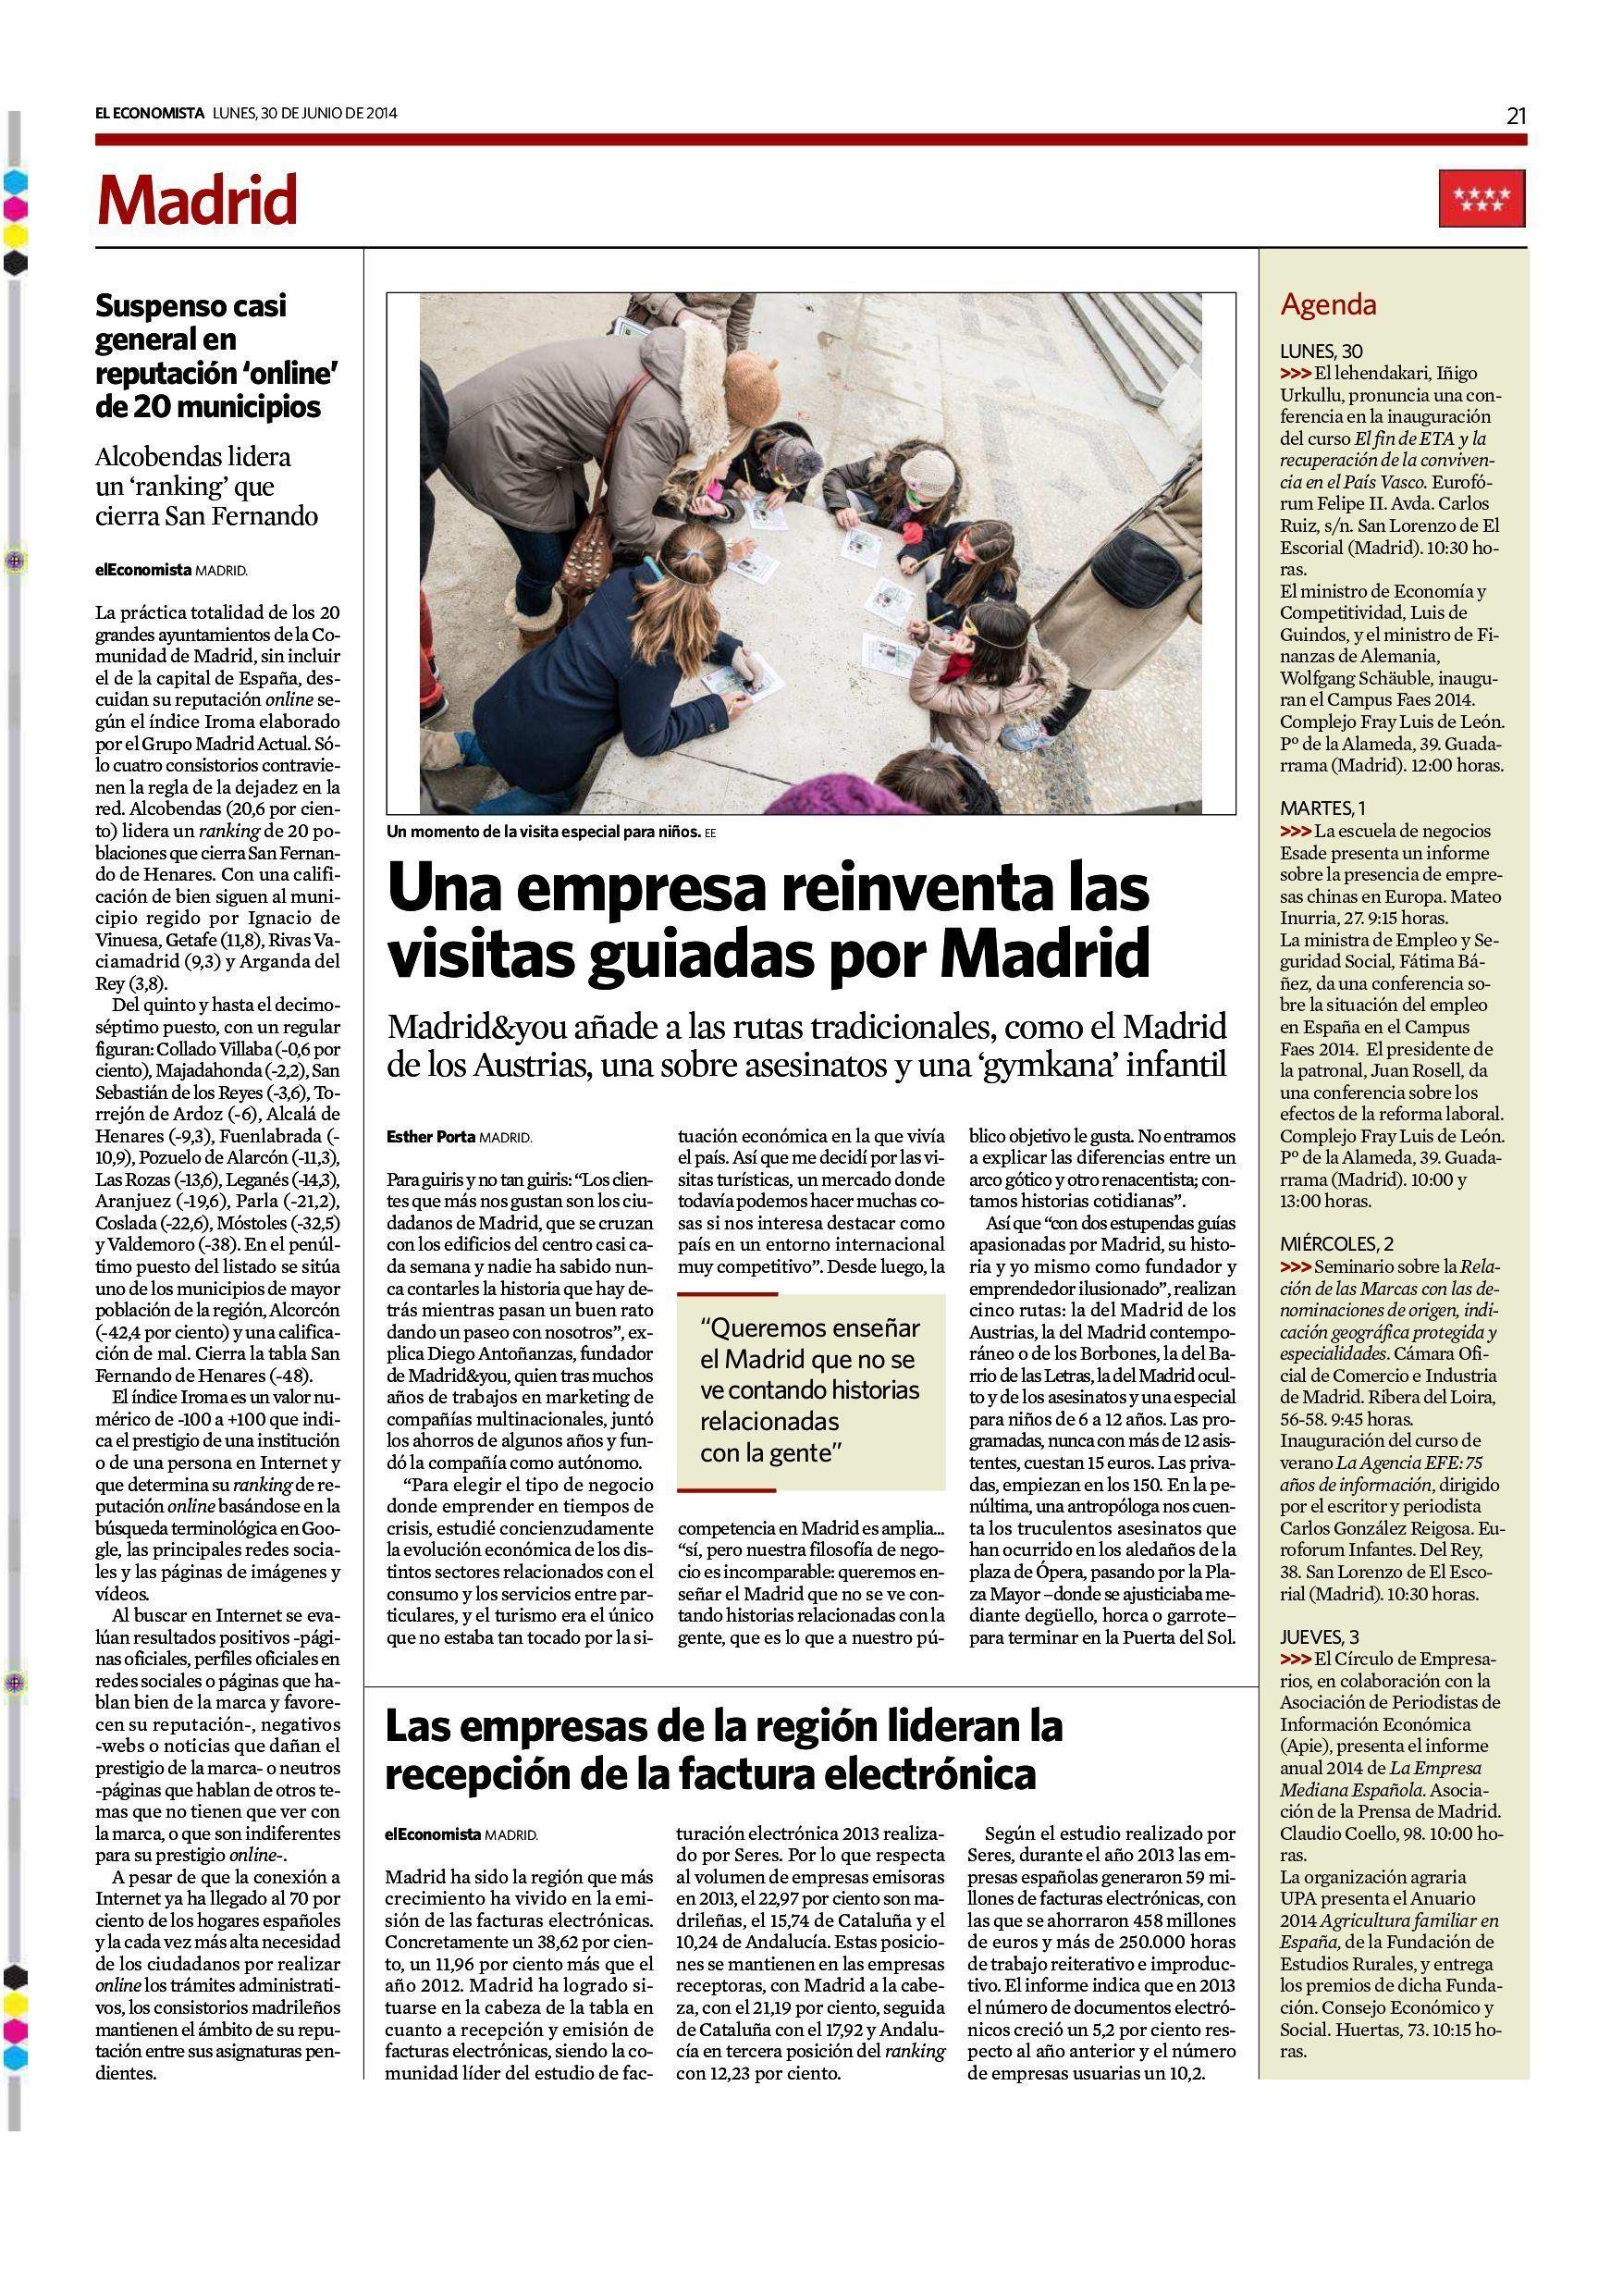 el Mundo Madrid and you